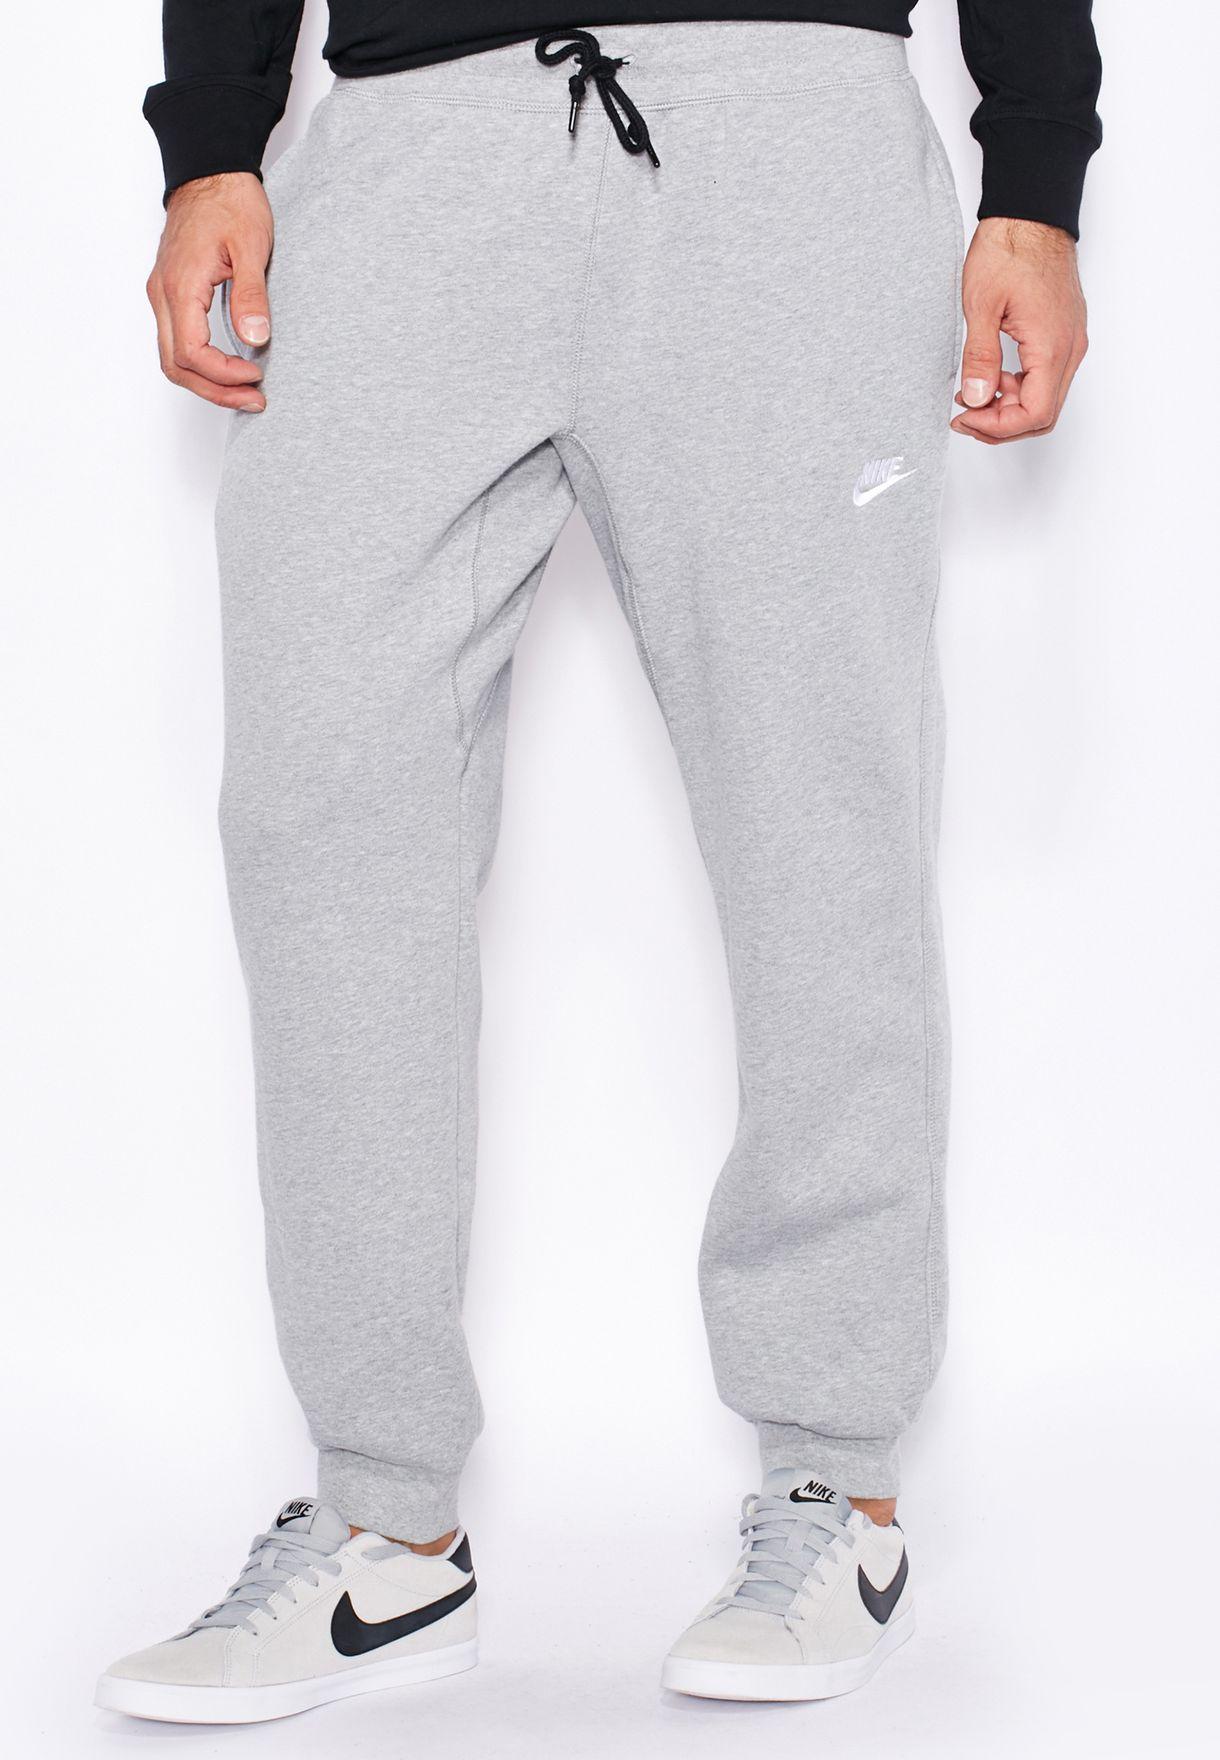 ad250fbb AW77 Cuffed Fleece Sweatpants